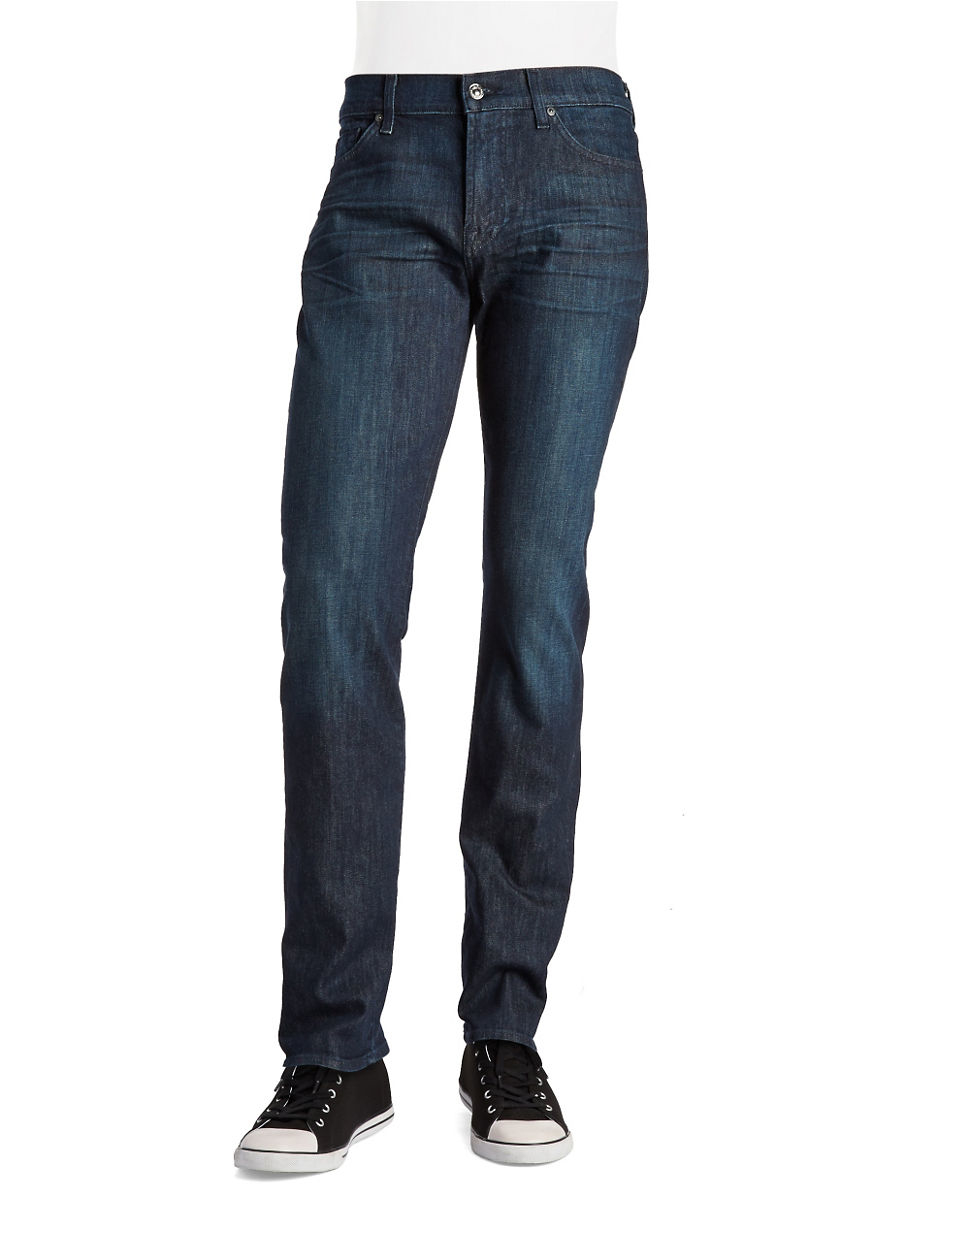 for all mankind slim straight jeans in blue for men lyst. Black Bedroom Furniture Sets. Home Design Ideas